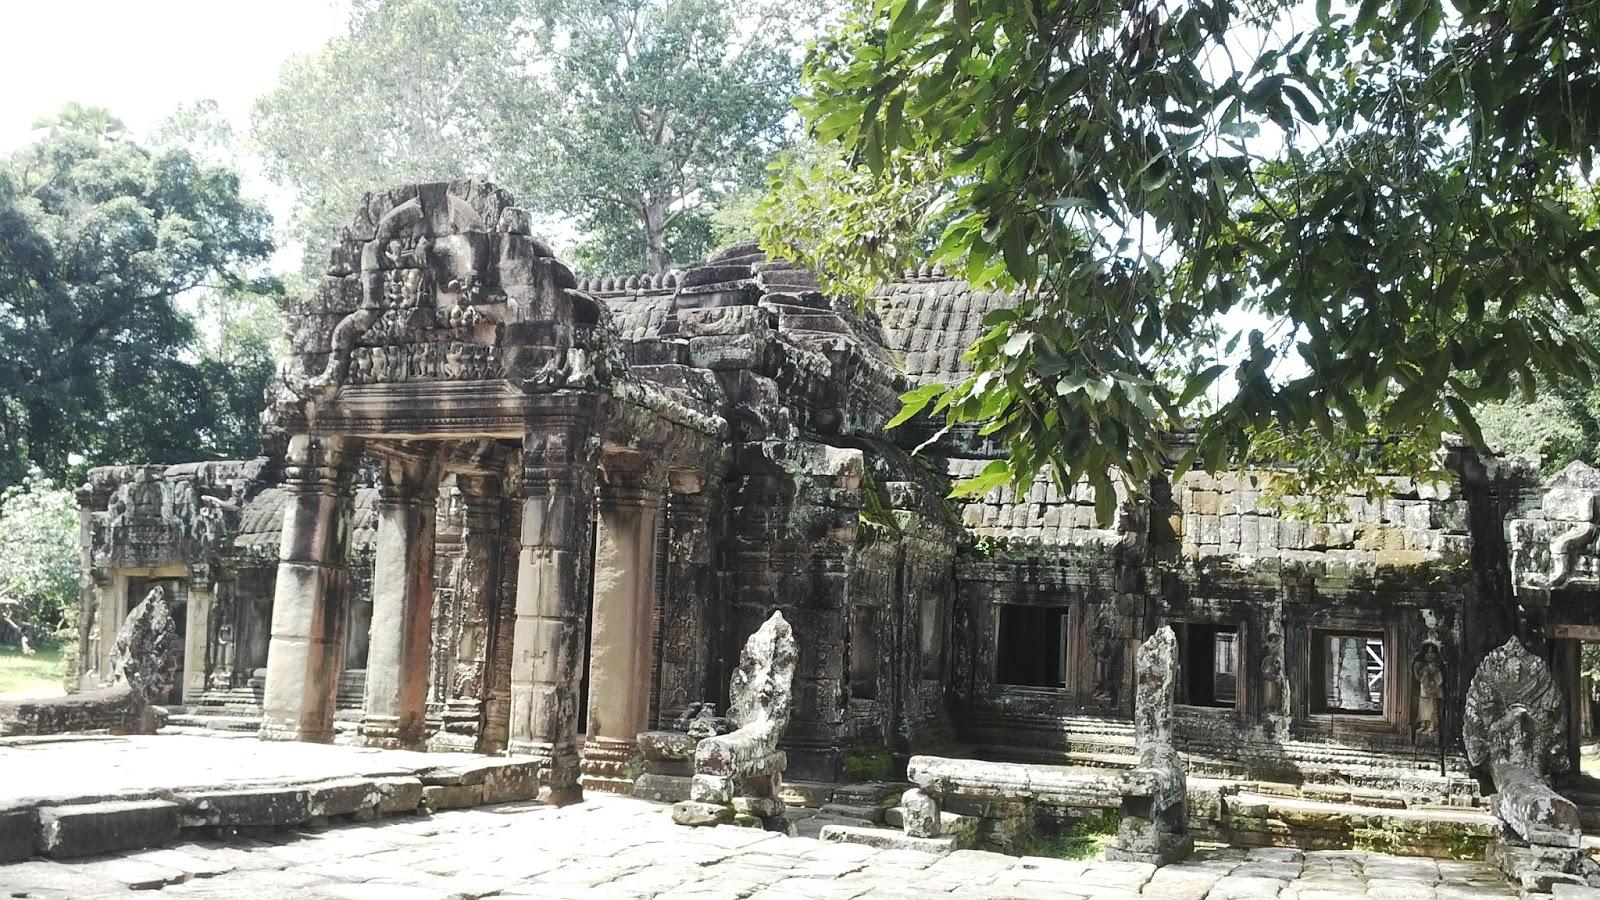 No Title 2016 Bolven Sekola 2 Cambodia Cultural Village Again Interesting Tengok Culture Dorg Kan Sambil Cuci Mata Hahaha Kbai Hahahaha